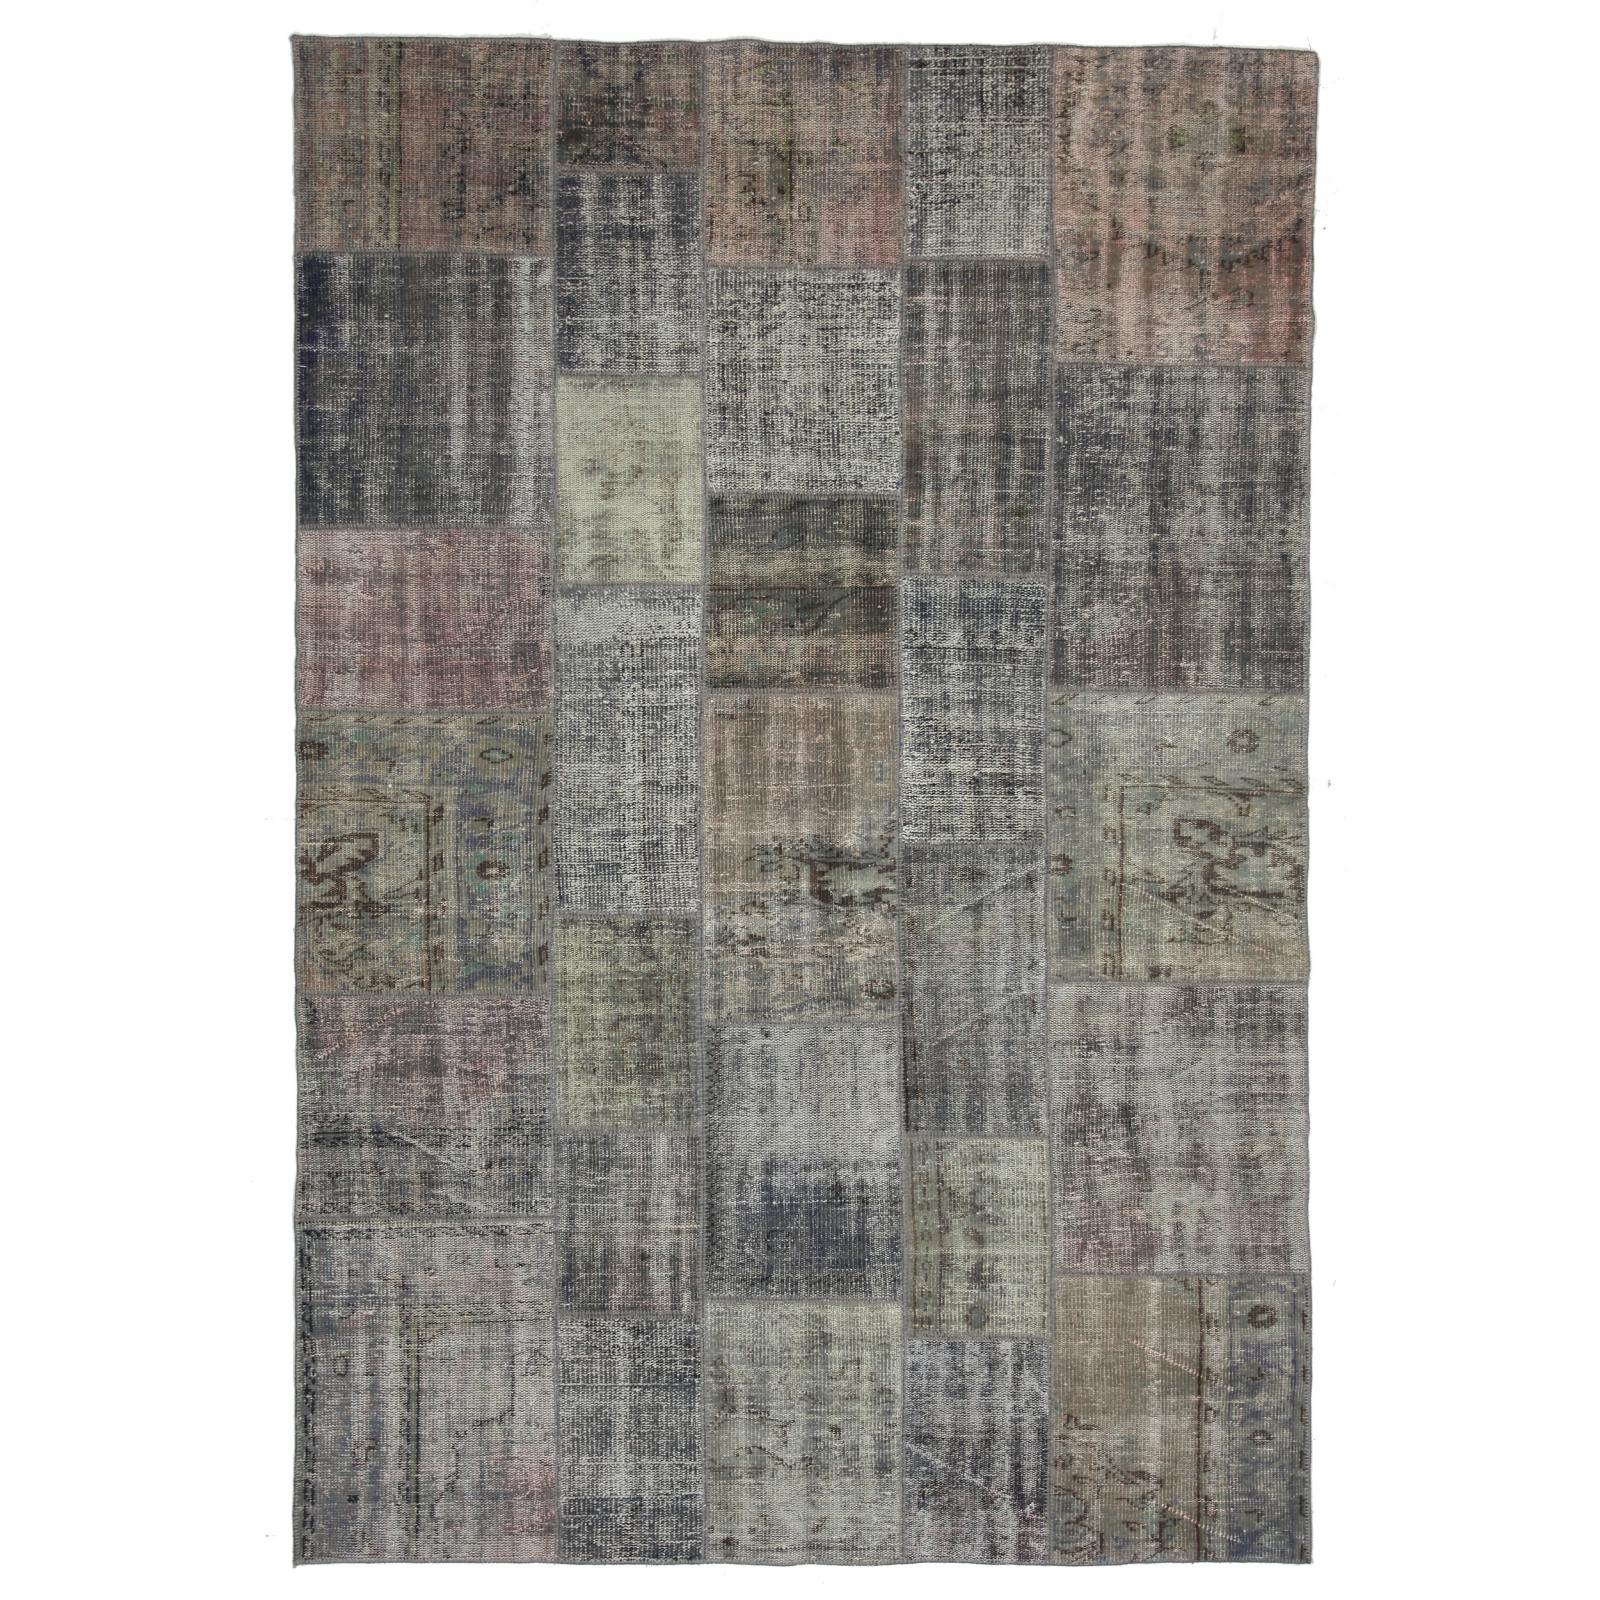 grau vintage patchwork flicken teppich 200x298cm. Black Bedroom Furniture Sets. Home Design Ideas